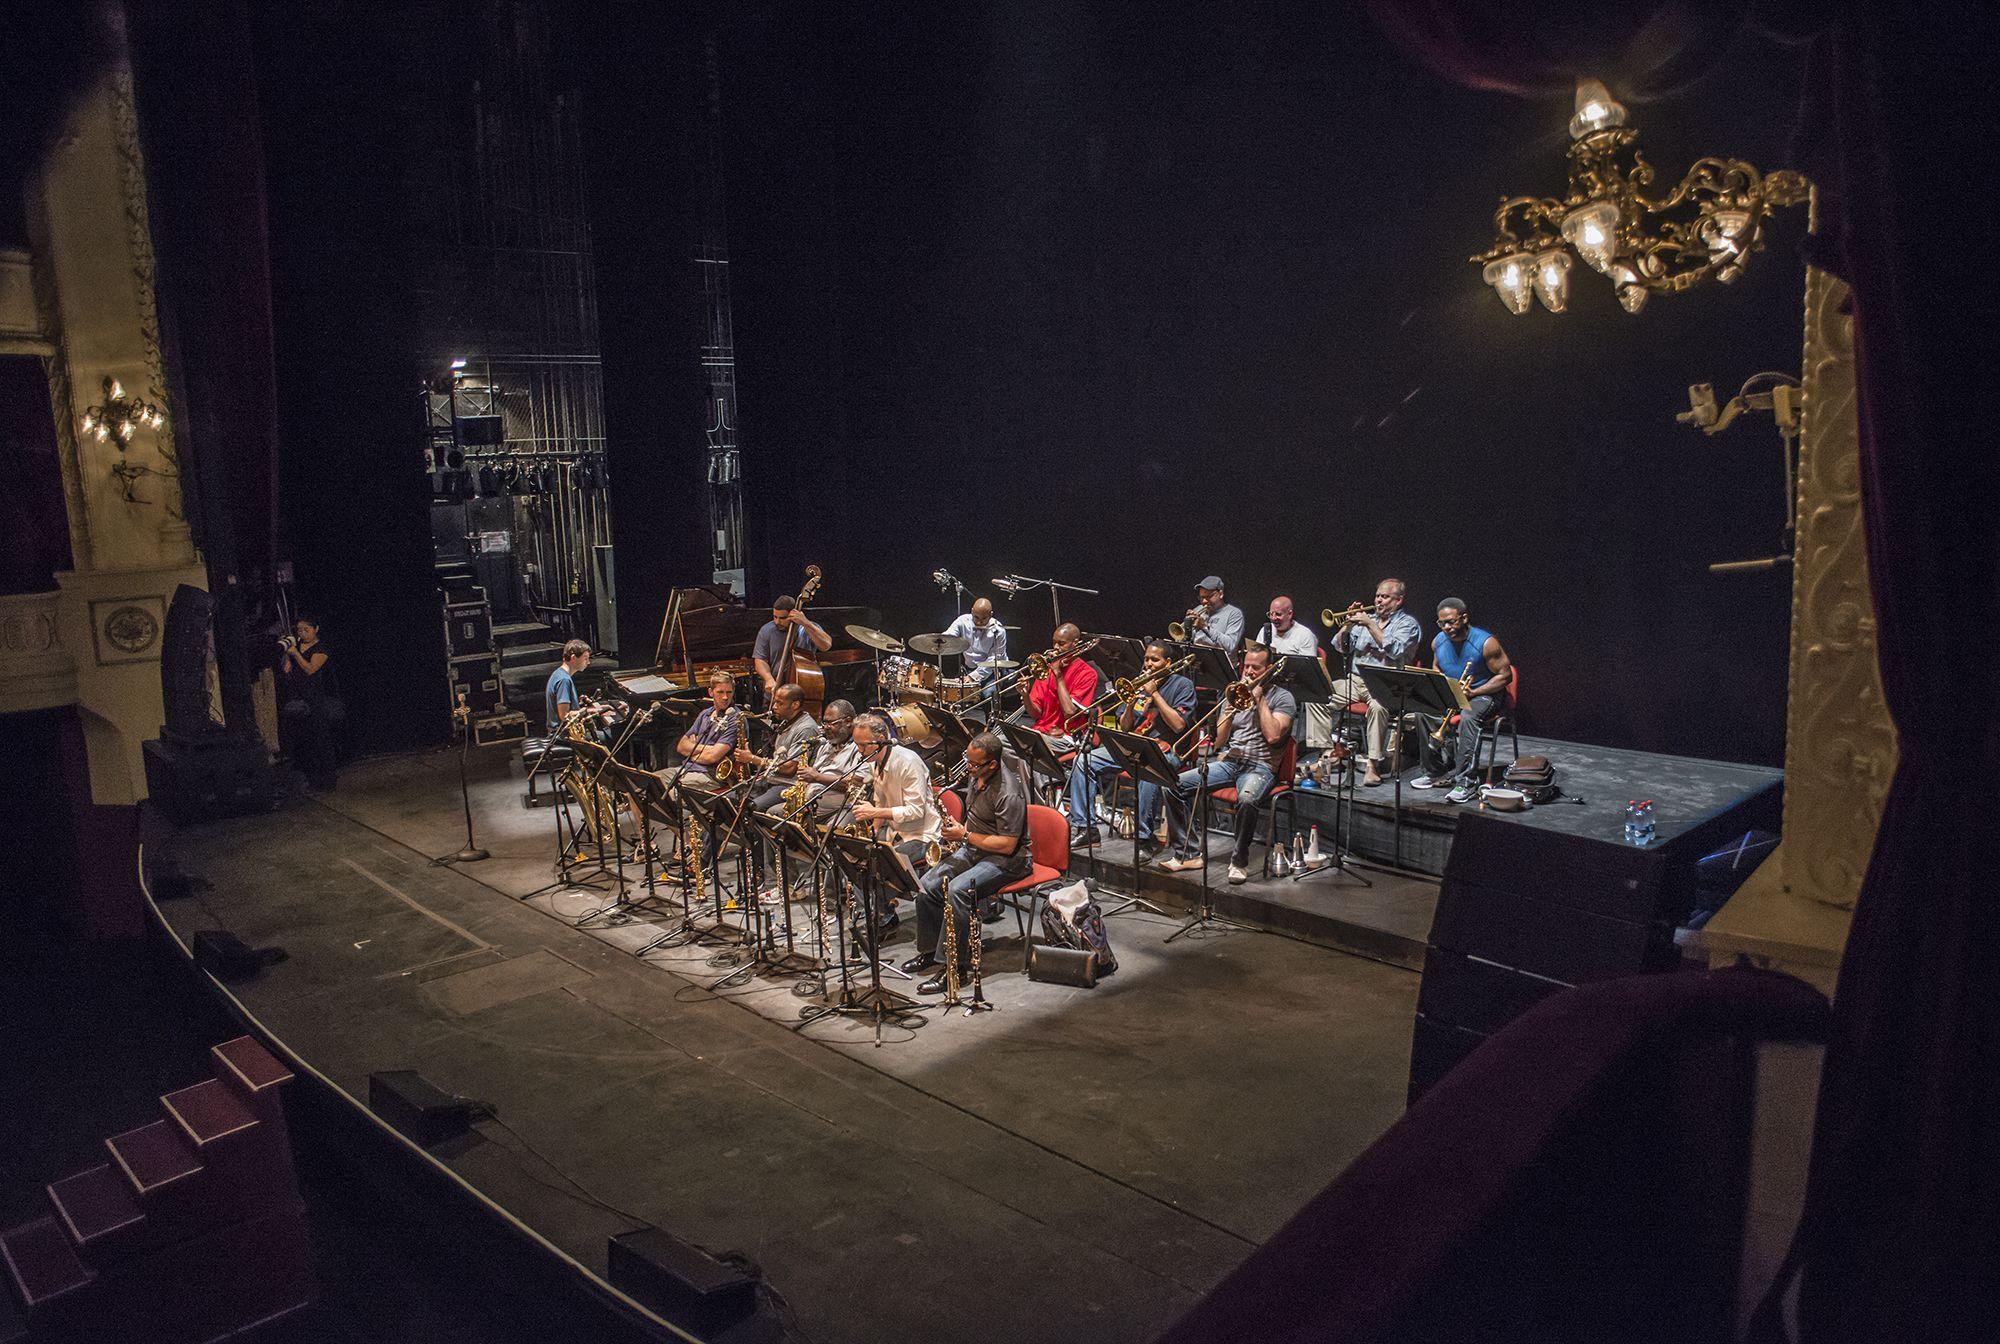 Ensayo de Jazz at Lincoln Center Jazz Orchestra. Foto: Patricio Melo